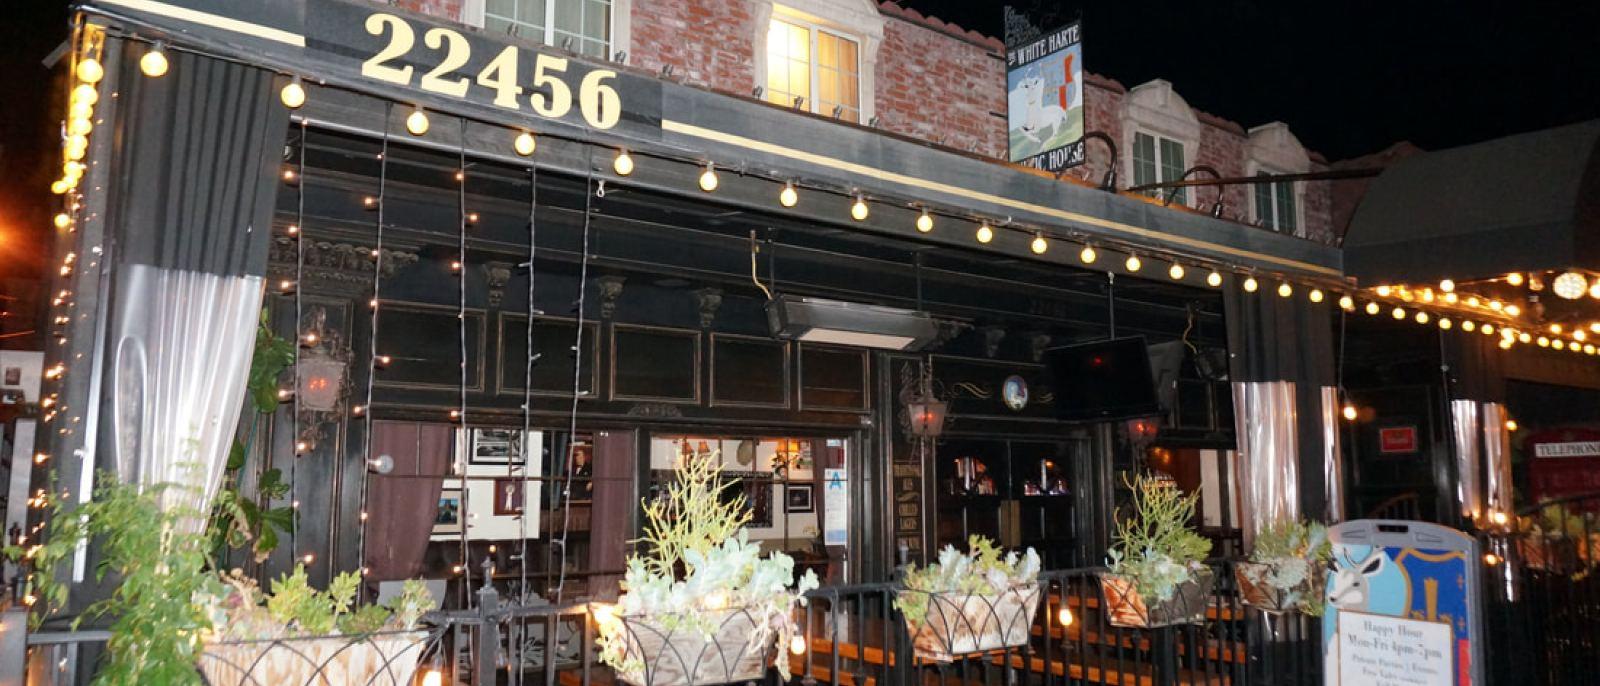 White Harte Pub in Woodland Hills